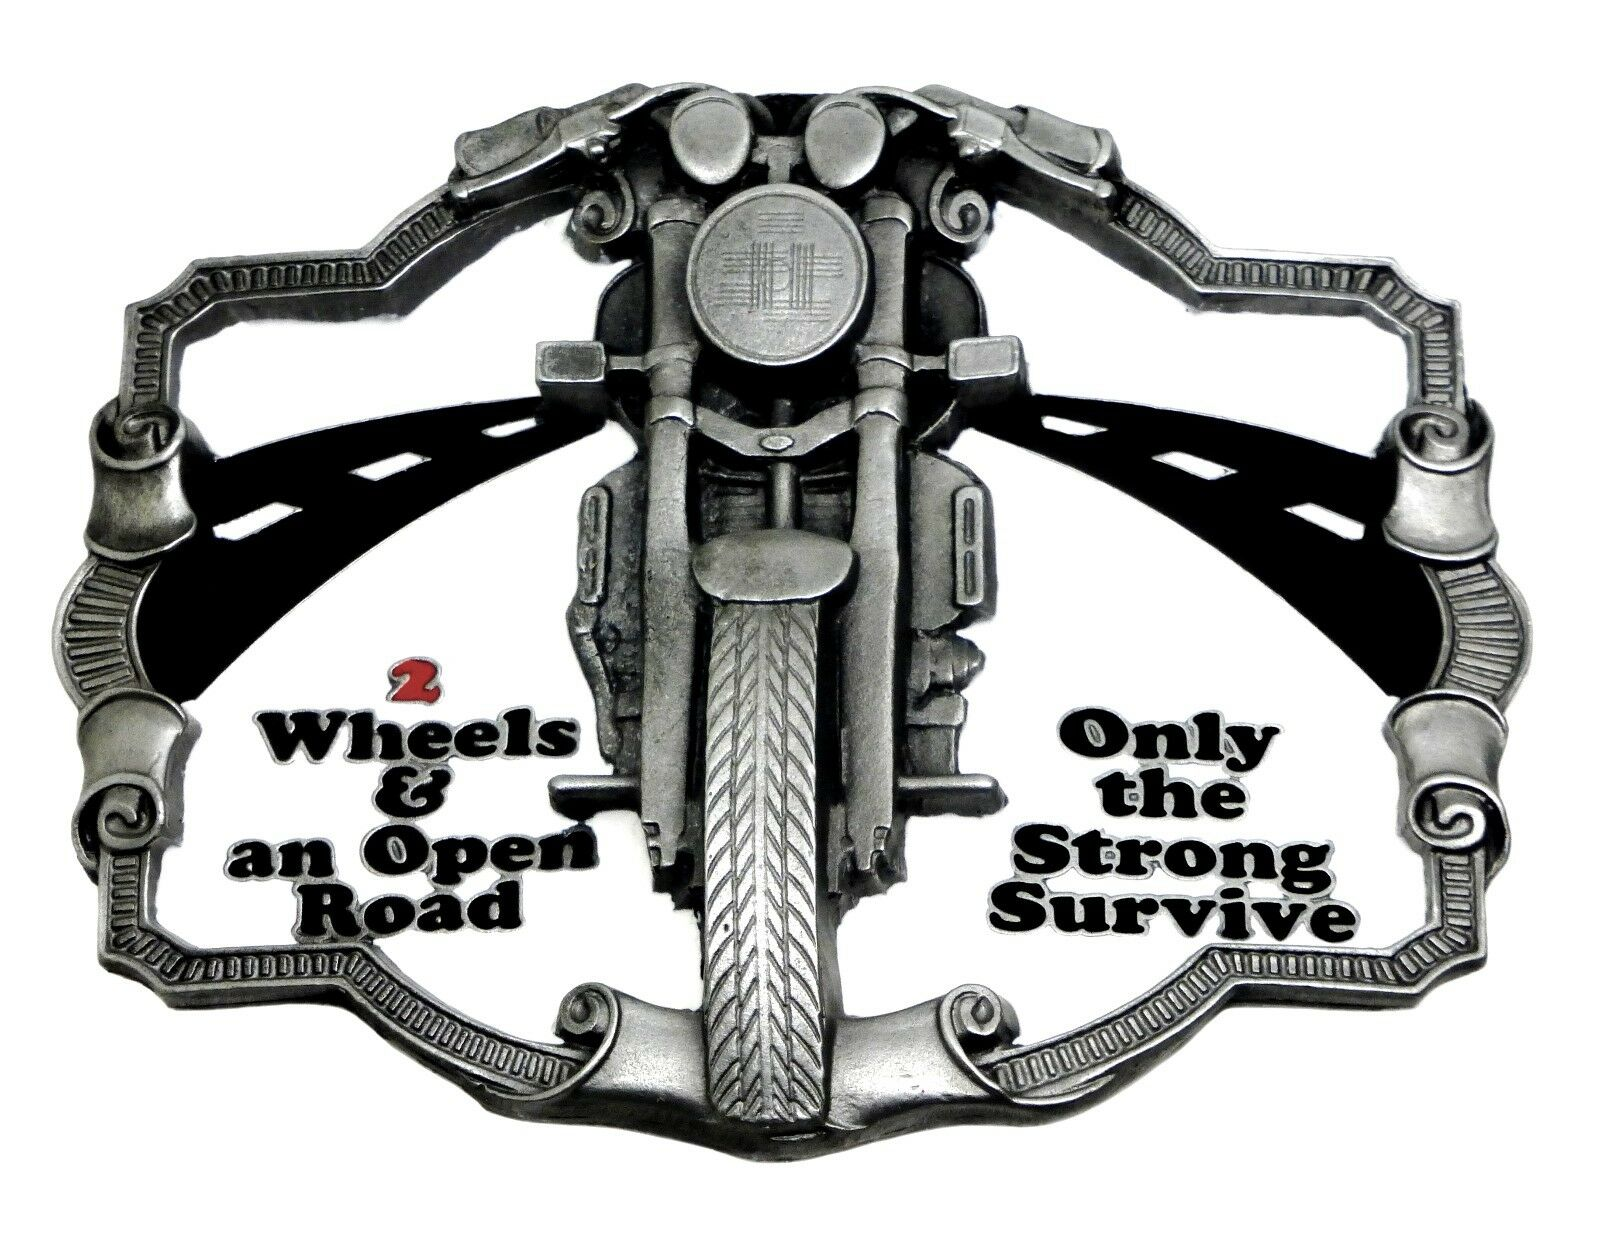 Biker Belt Buckle Motorcycle 2 Wheels & Open Road Bike Authentic Dragon Designs